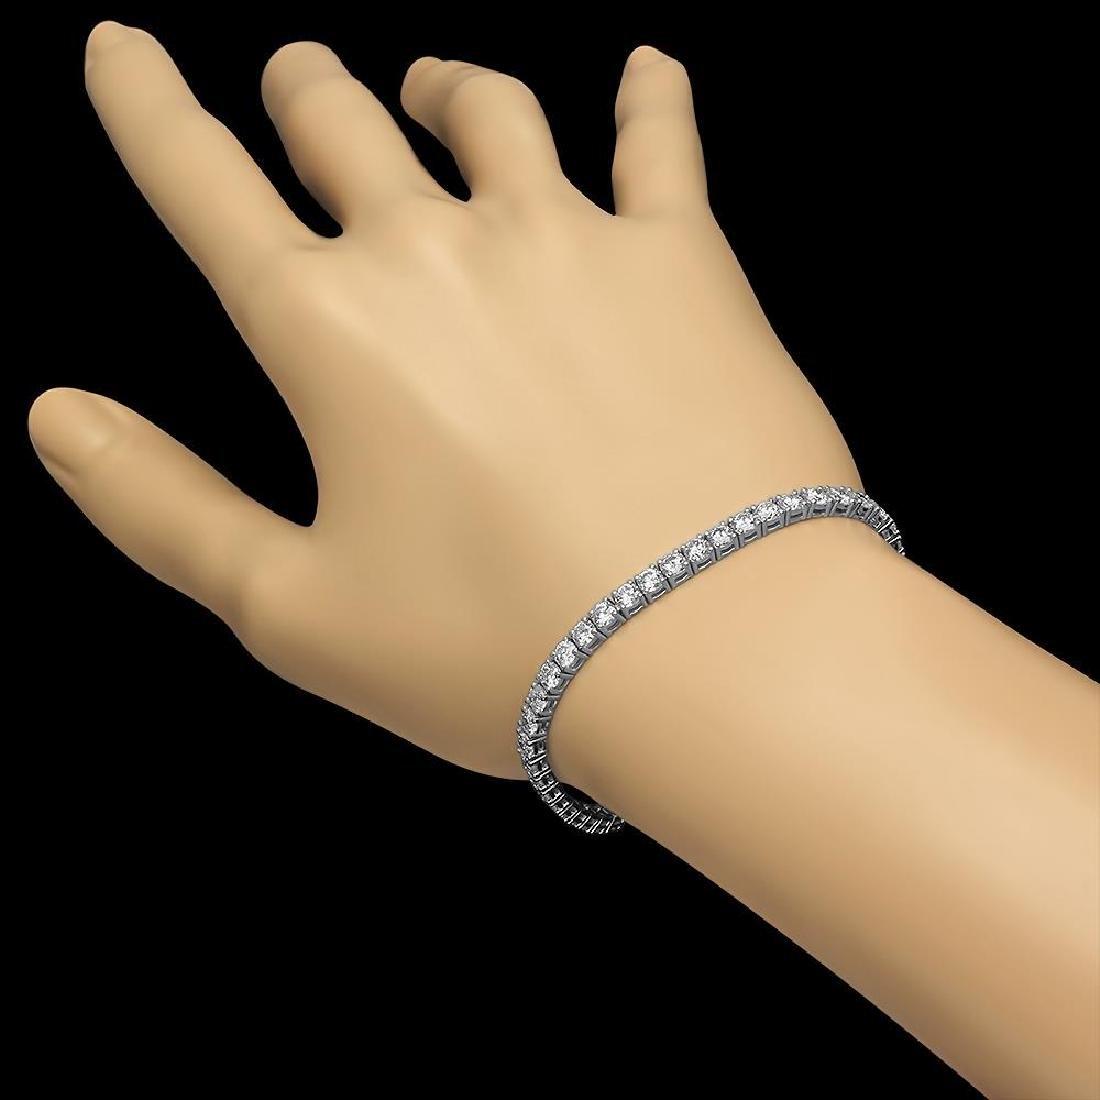 18K Gold 7.82ct Diamond Bracelet - 2